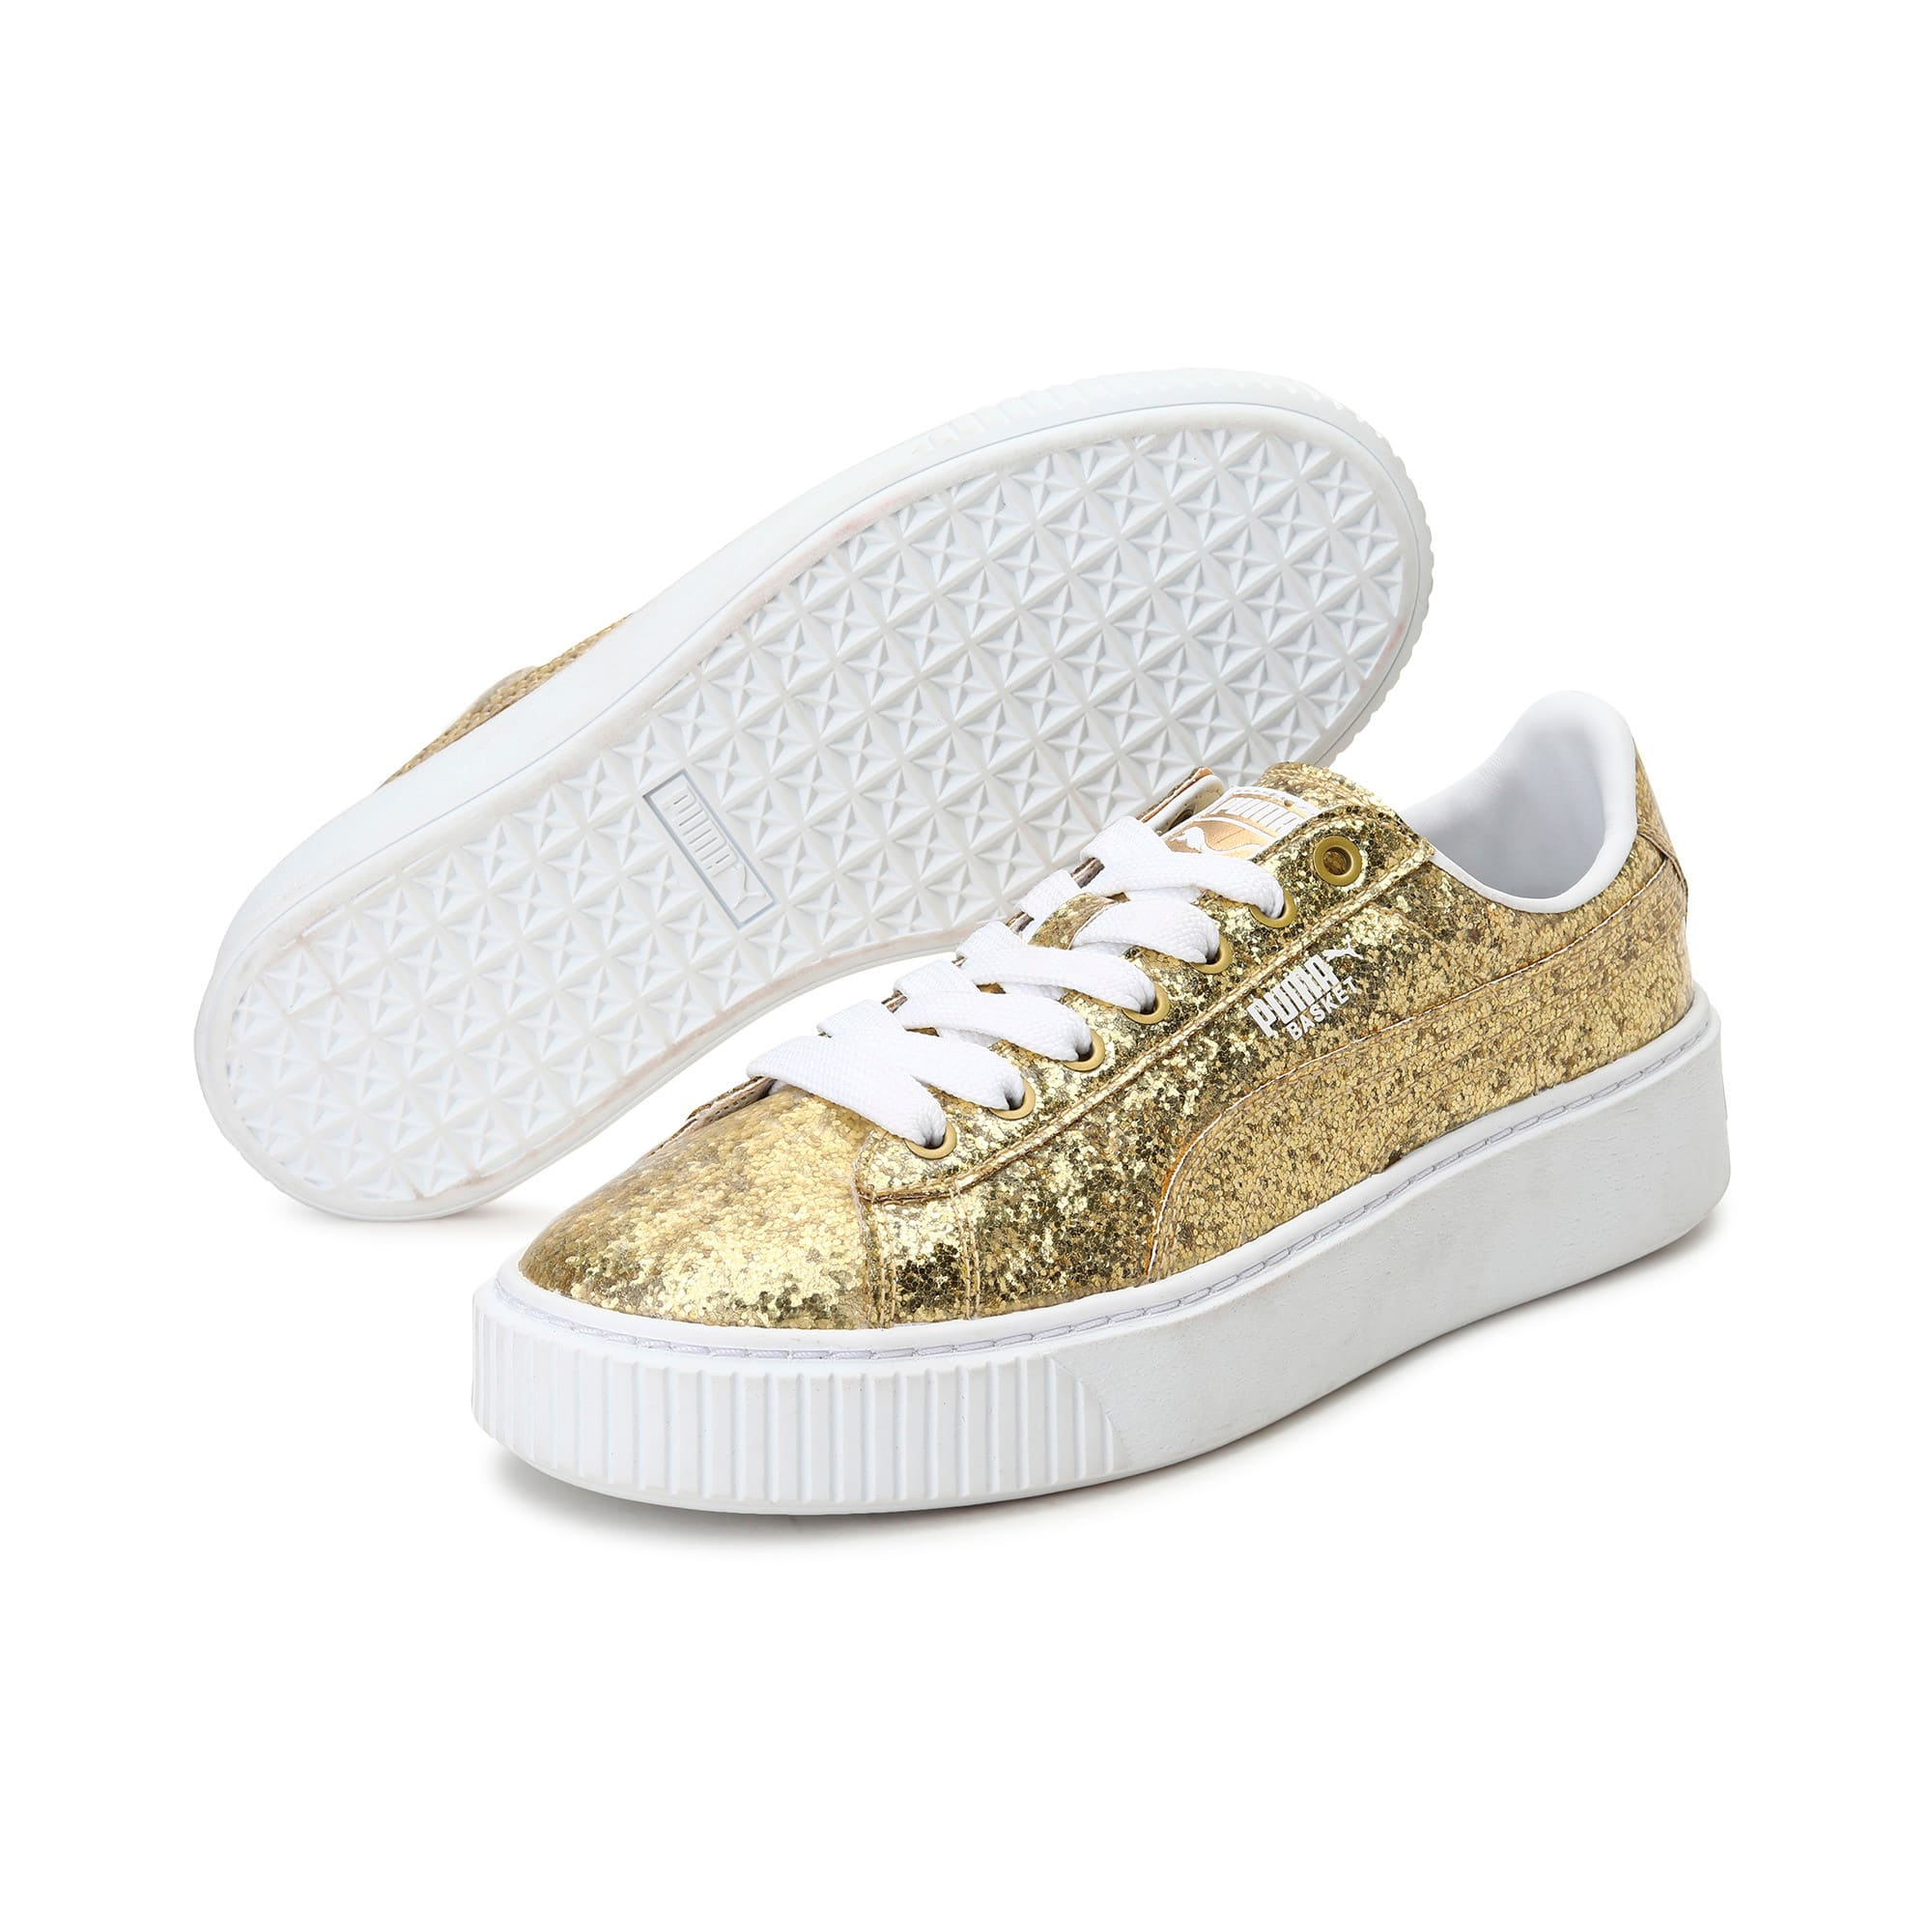 Thumbnail 2 of Basket Platform Glitter Women's Trainers, Gold-Gold, medium-IND